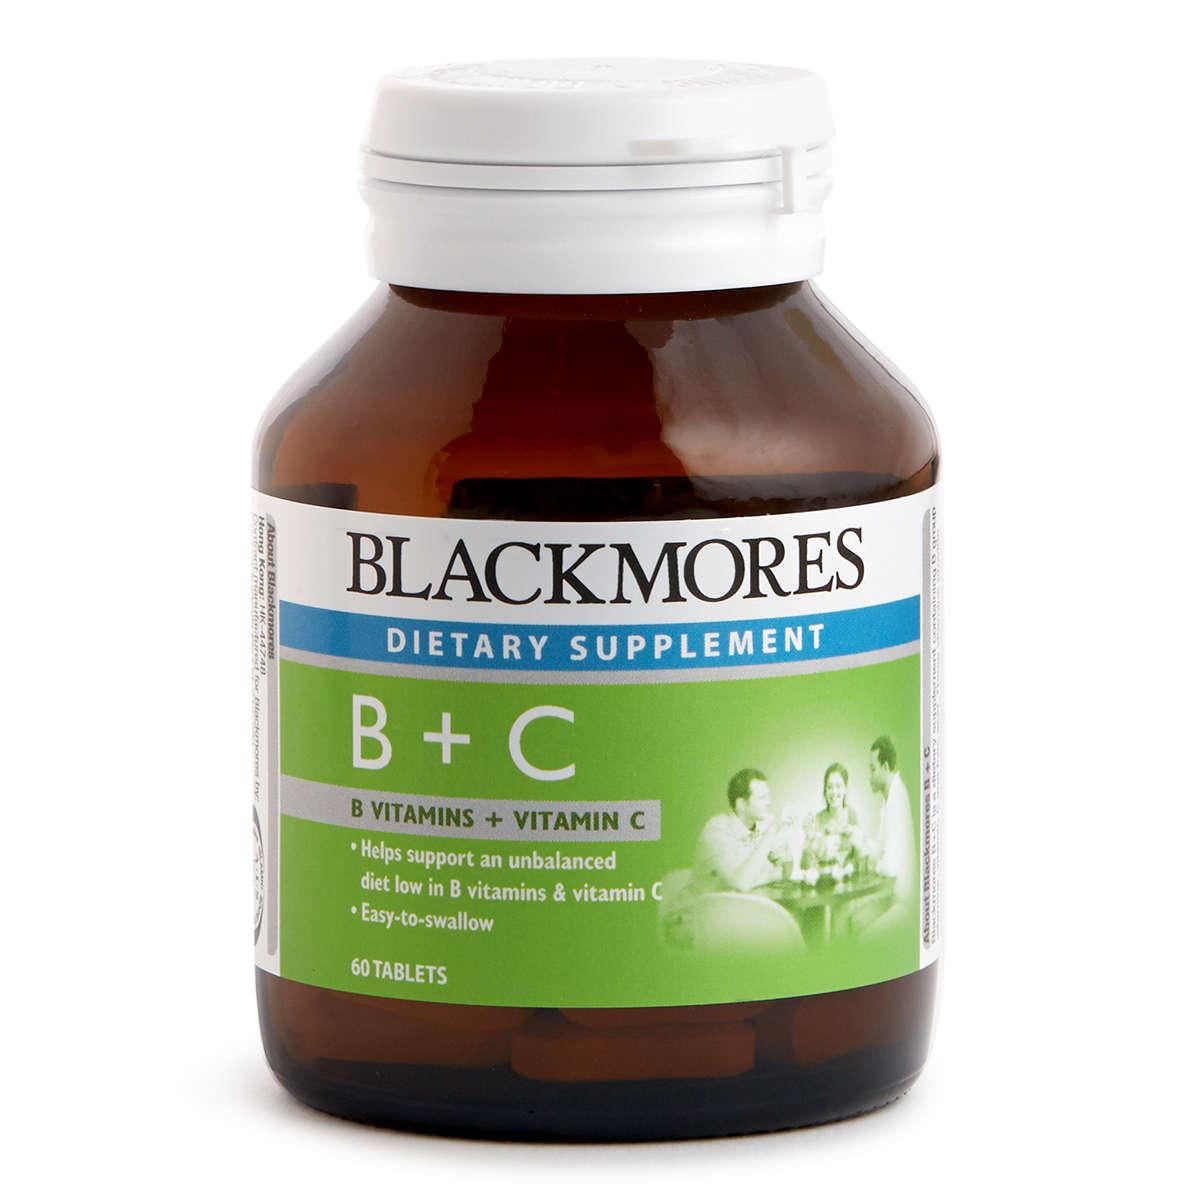 B + C 60 Tablets